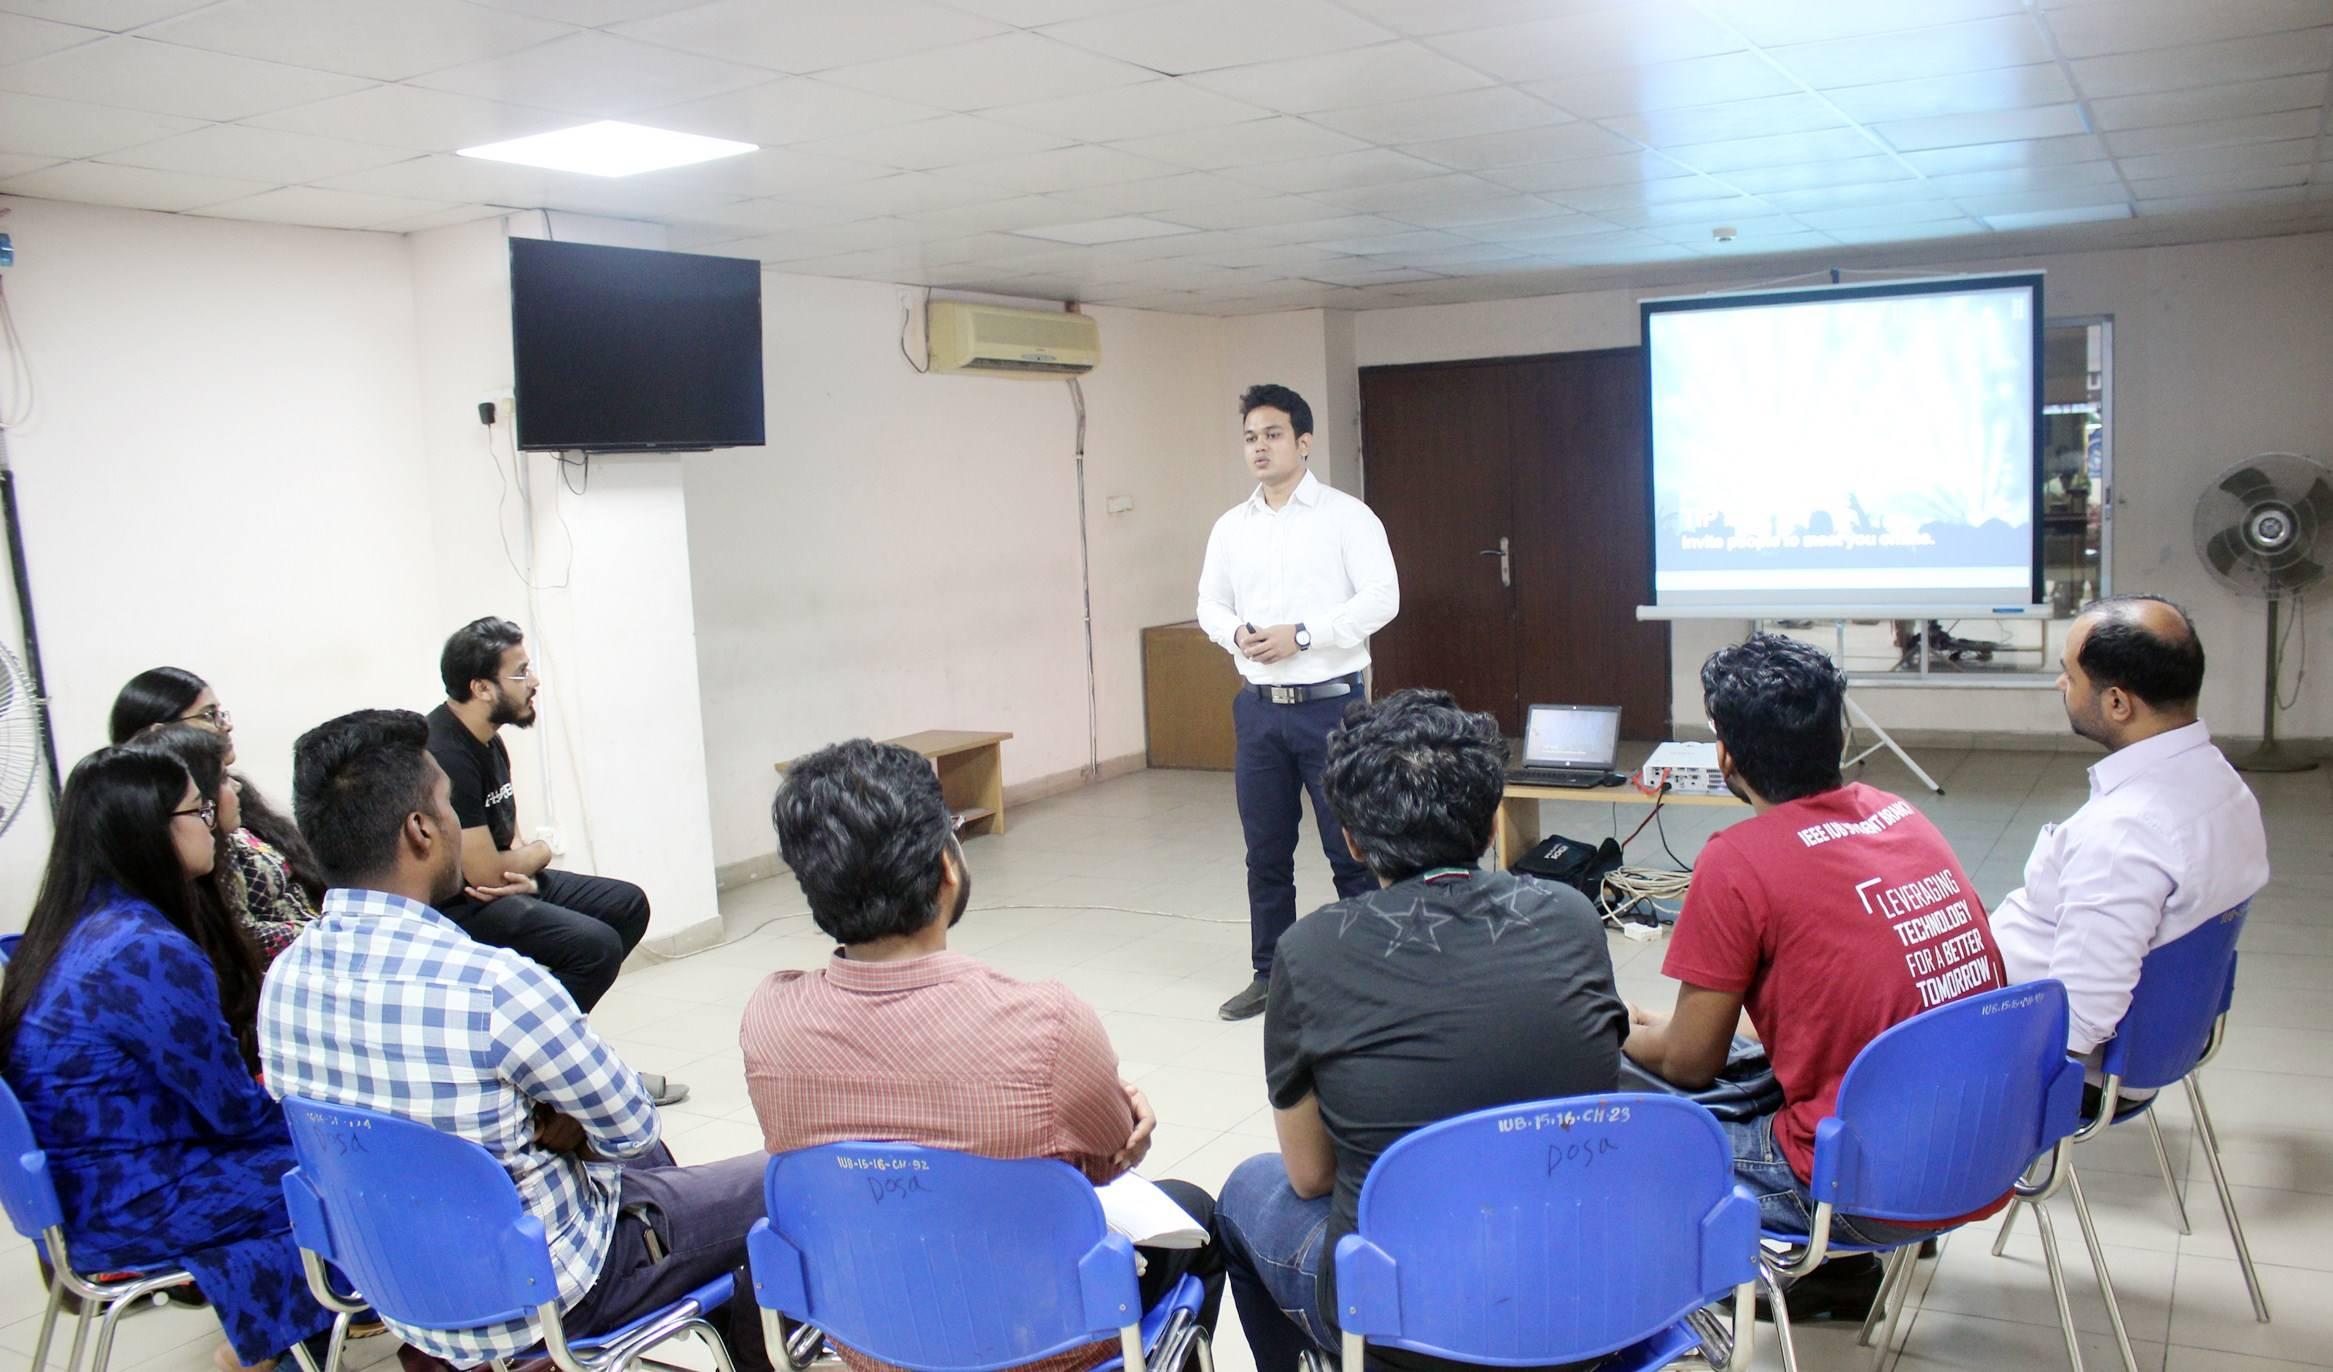 Workshop on LikedIN Profile Development at IUB by ICDB